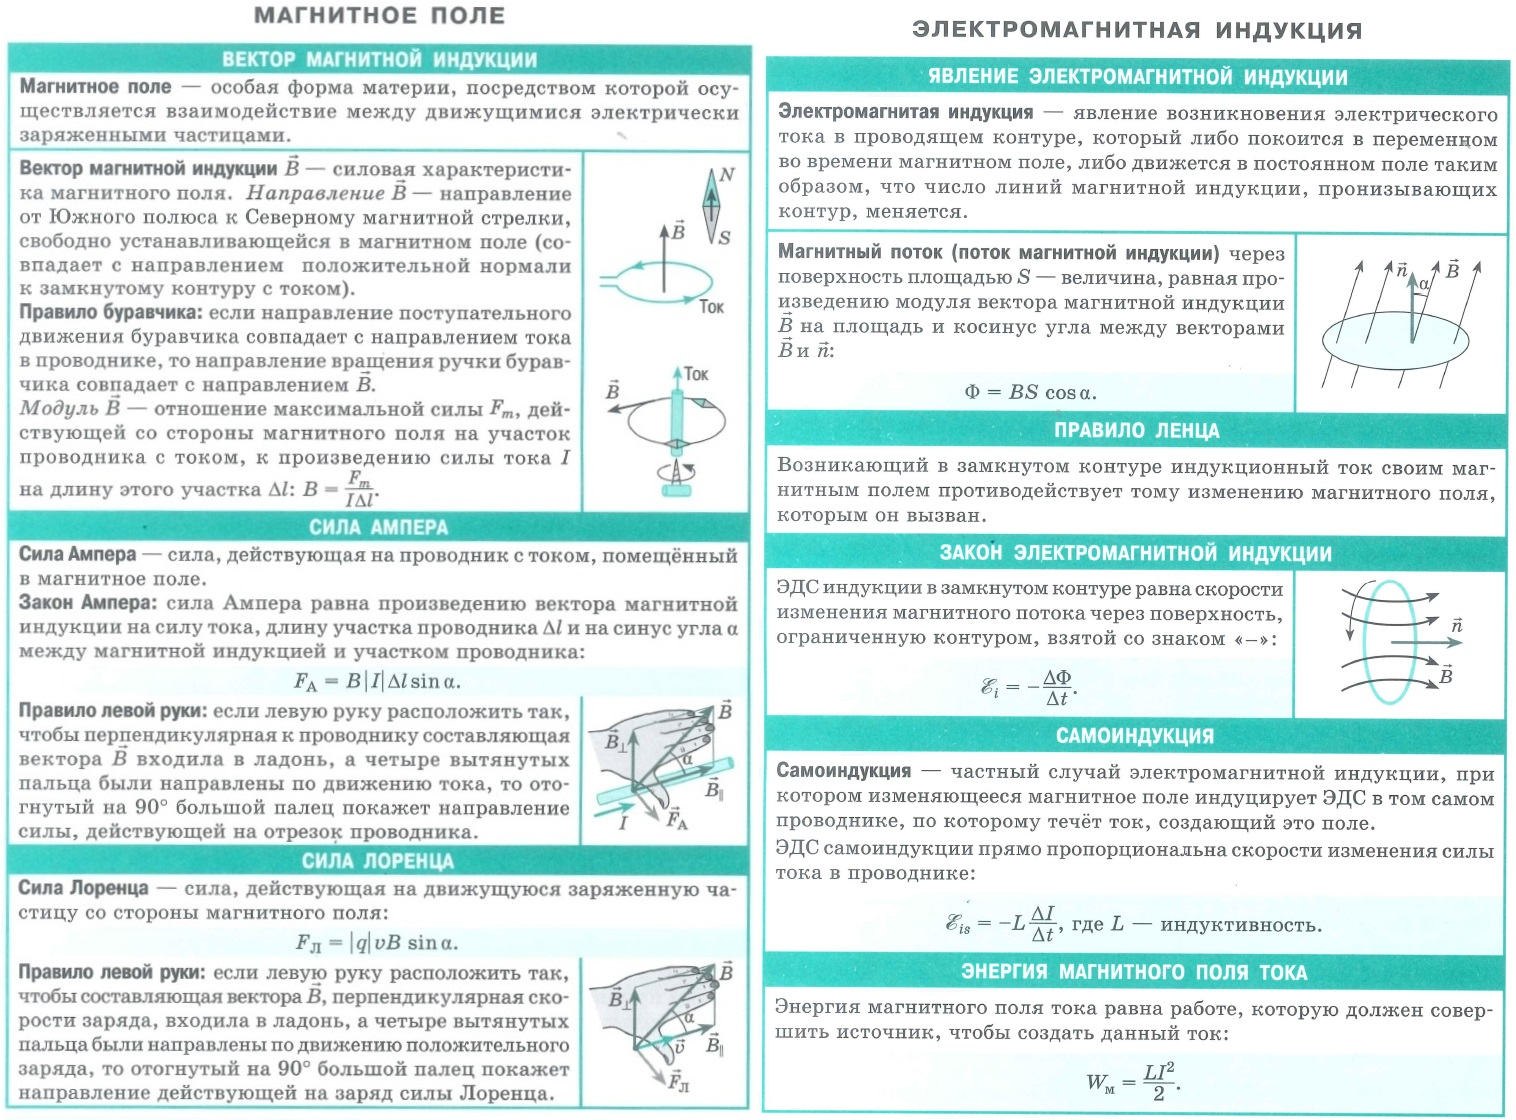 9 электромагнитное по класс поле шпаргалка физике